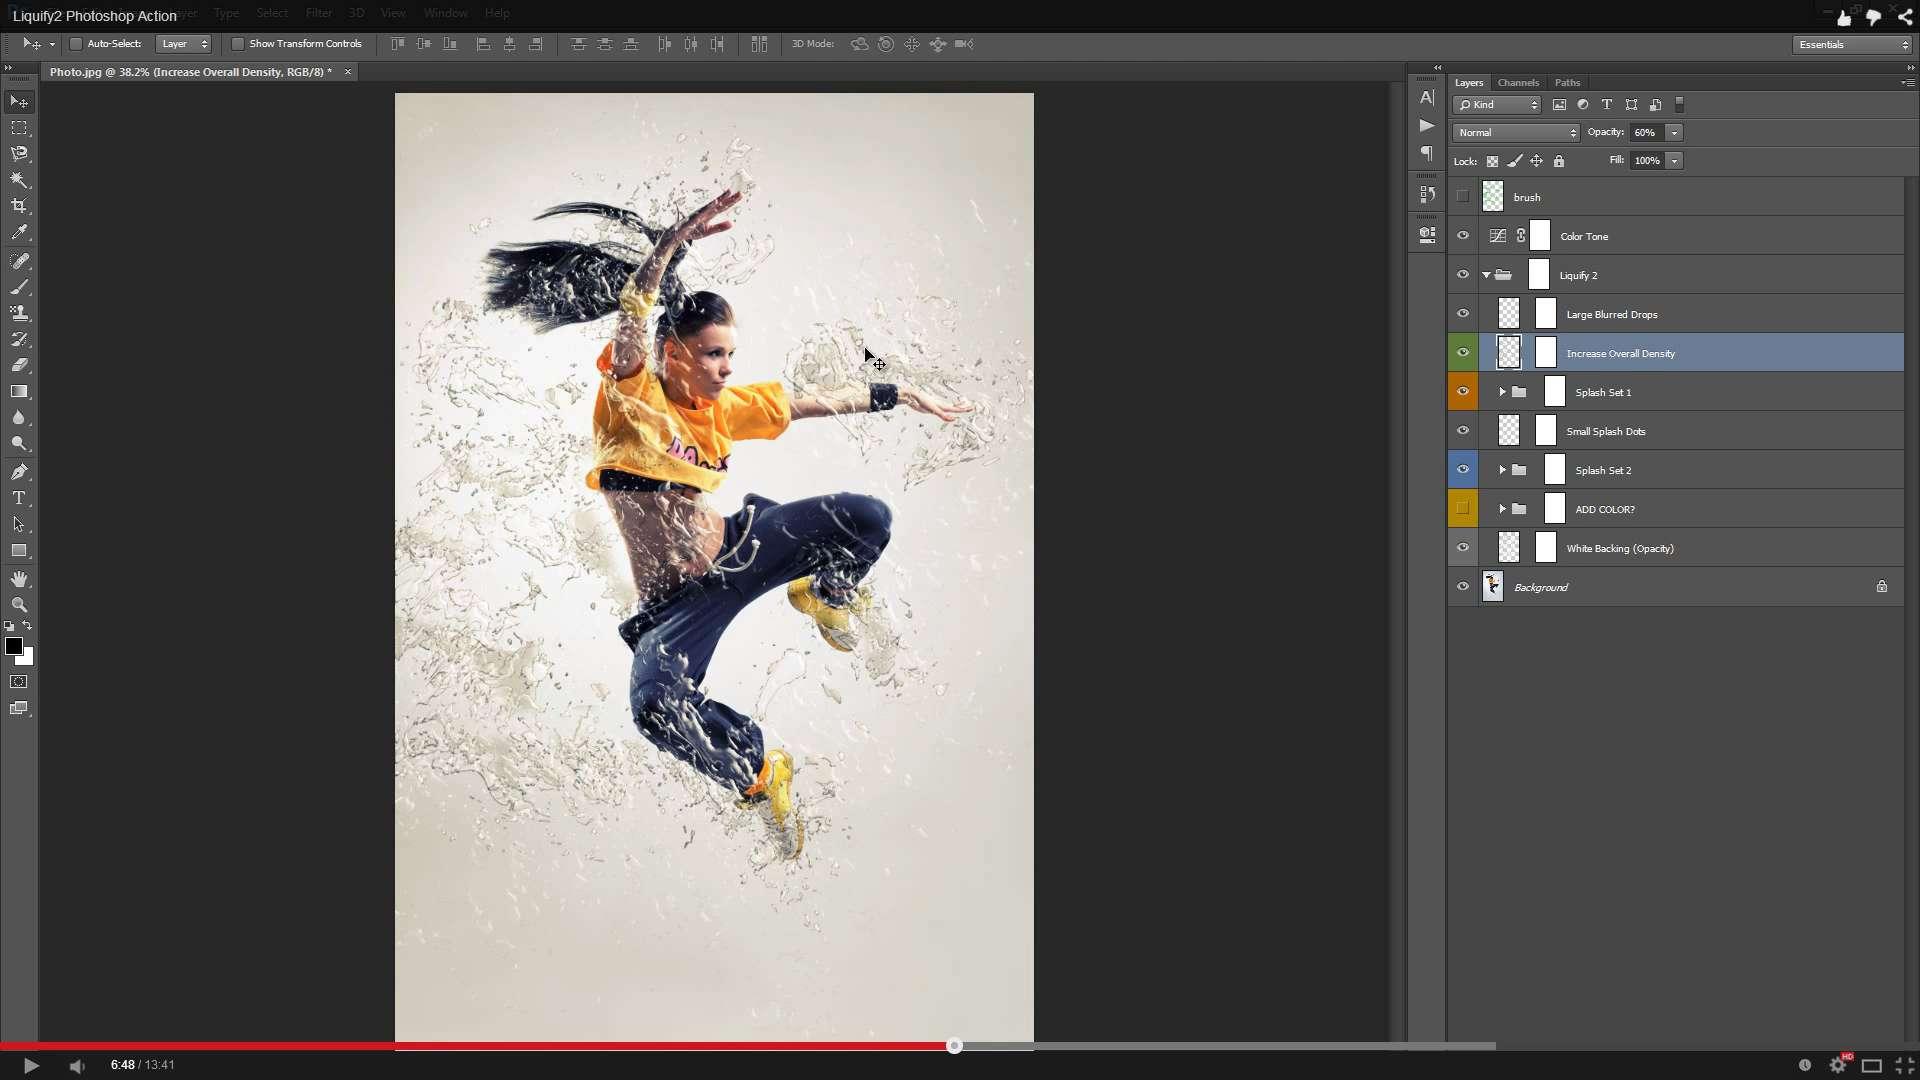 Liquify 2 Photoshop Action